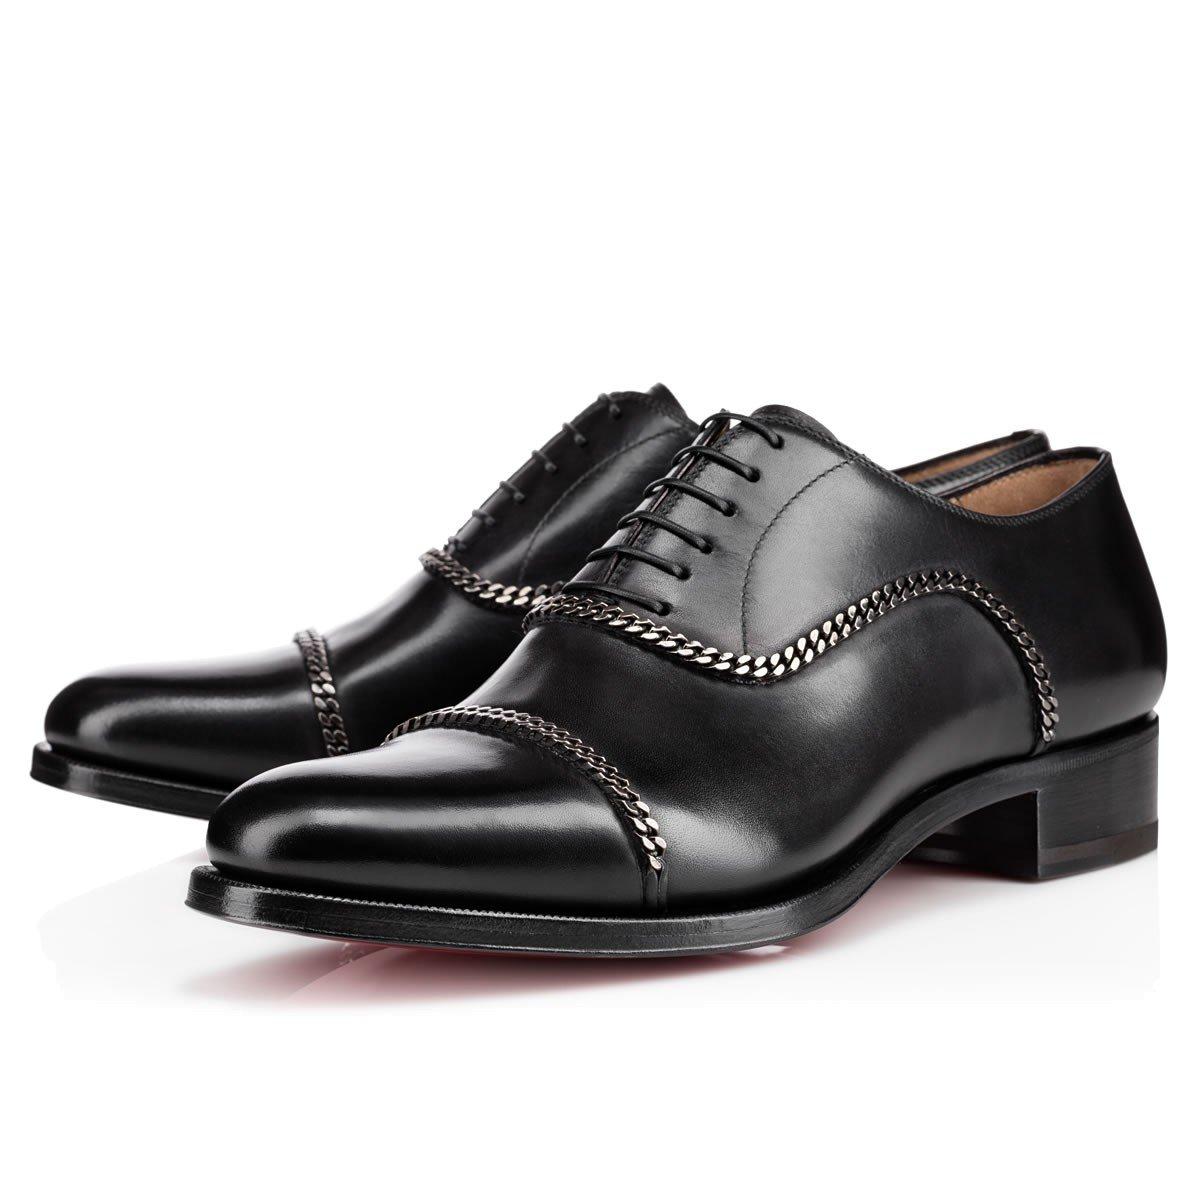 Black School Shoes Edinburgh